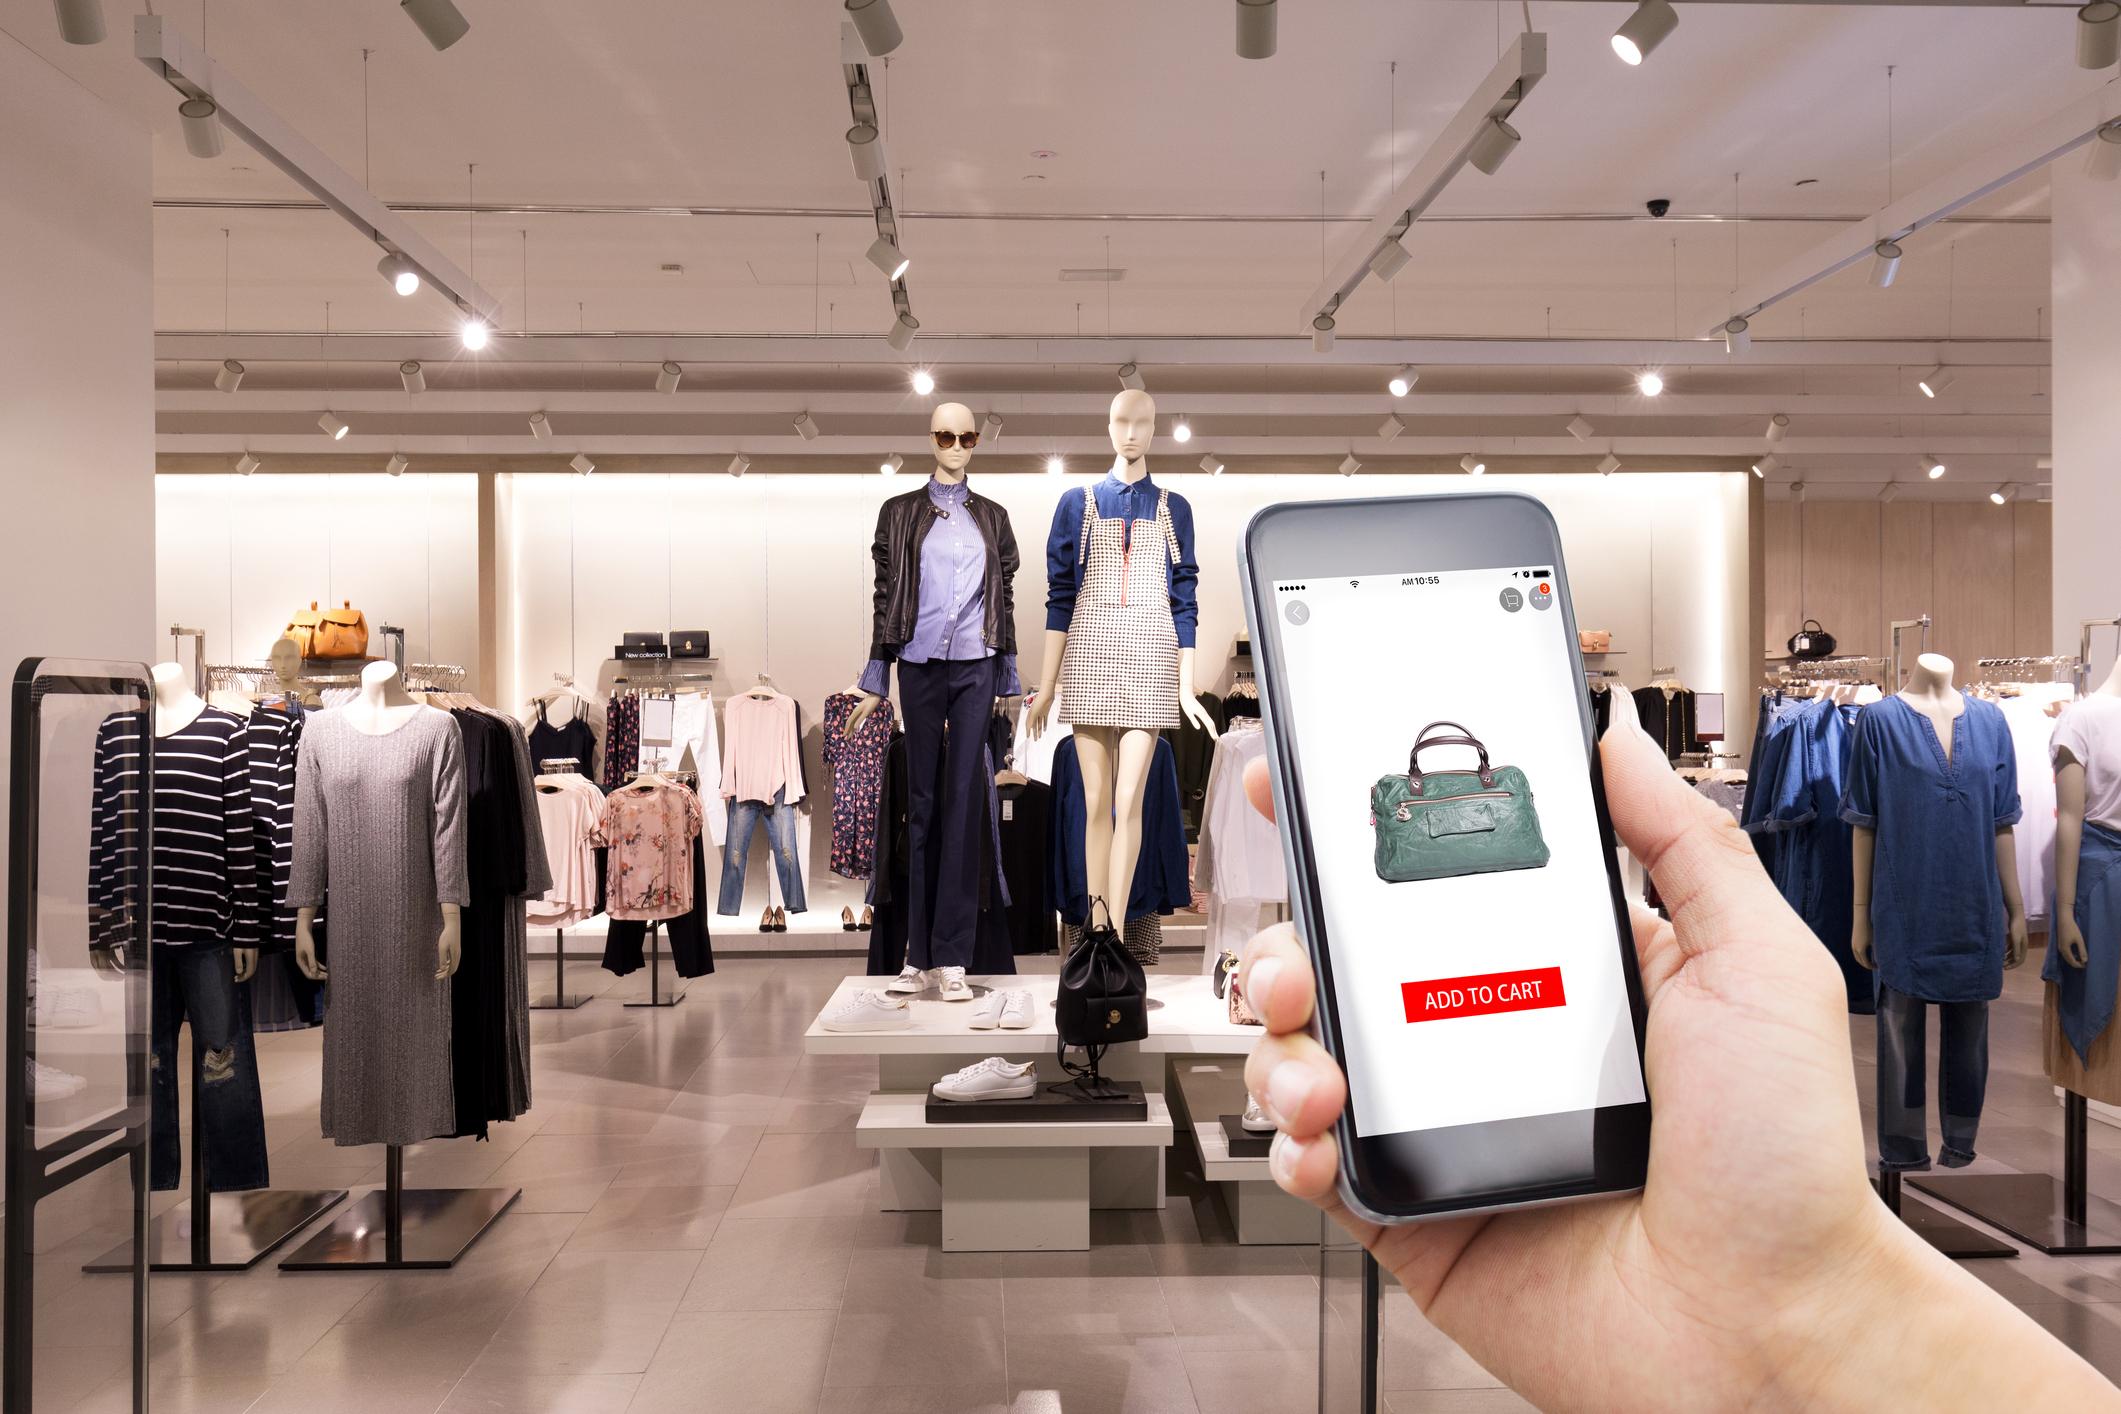 A shopper checks an online purchase at a store.